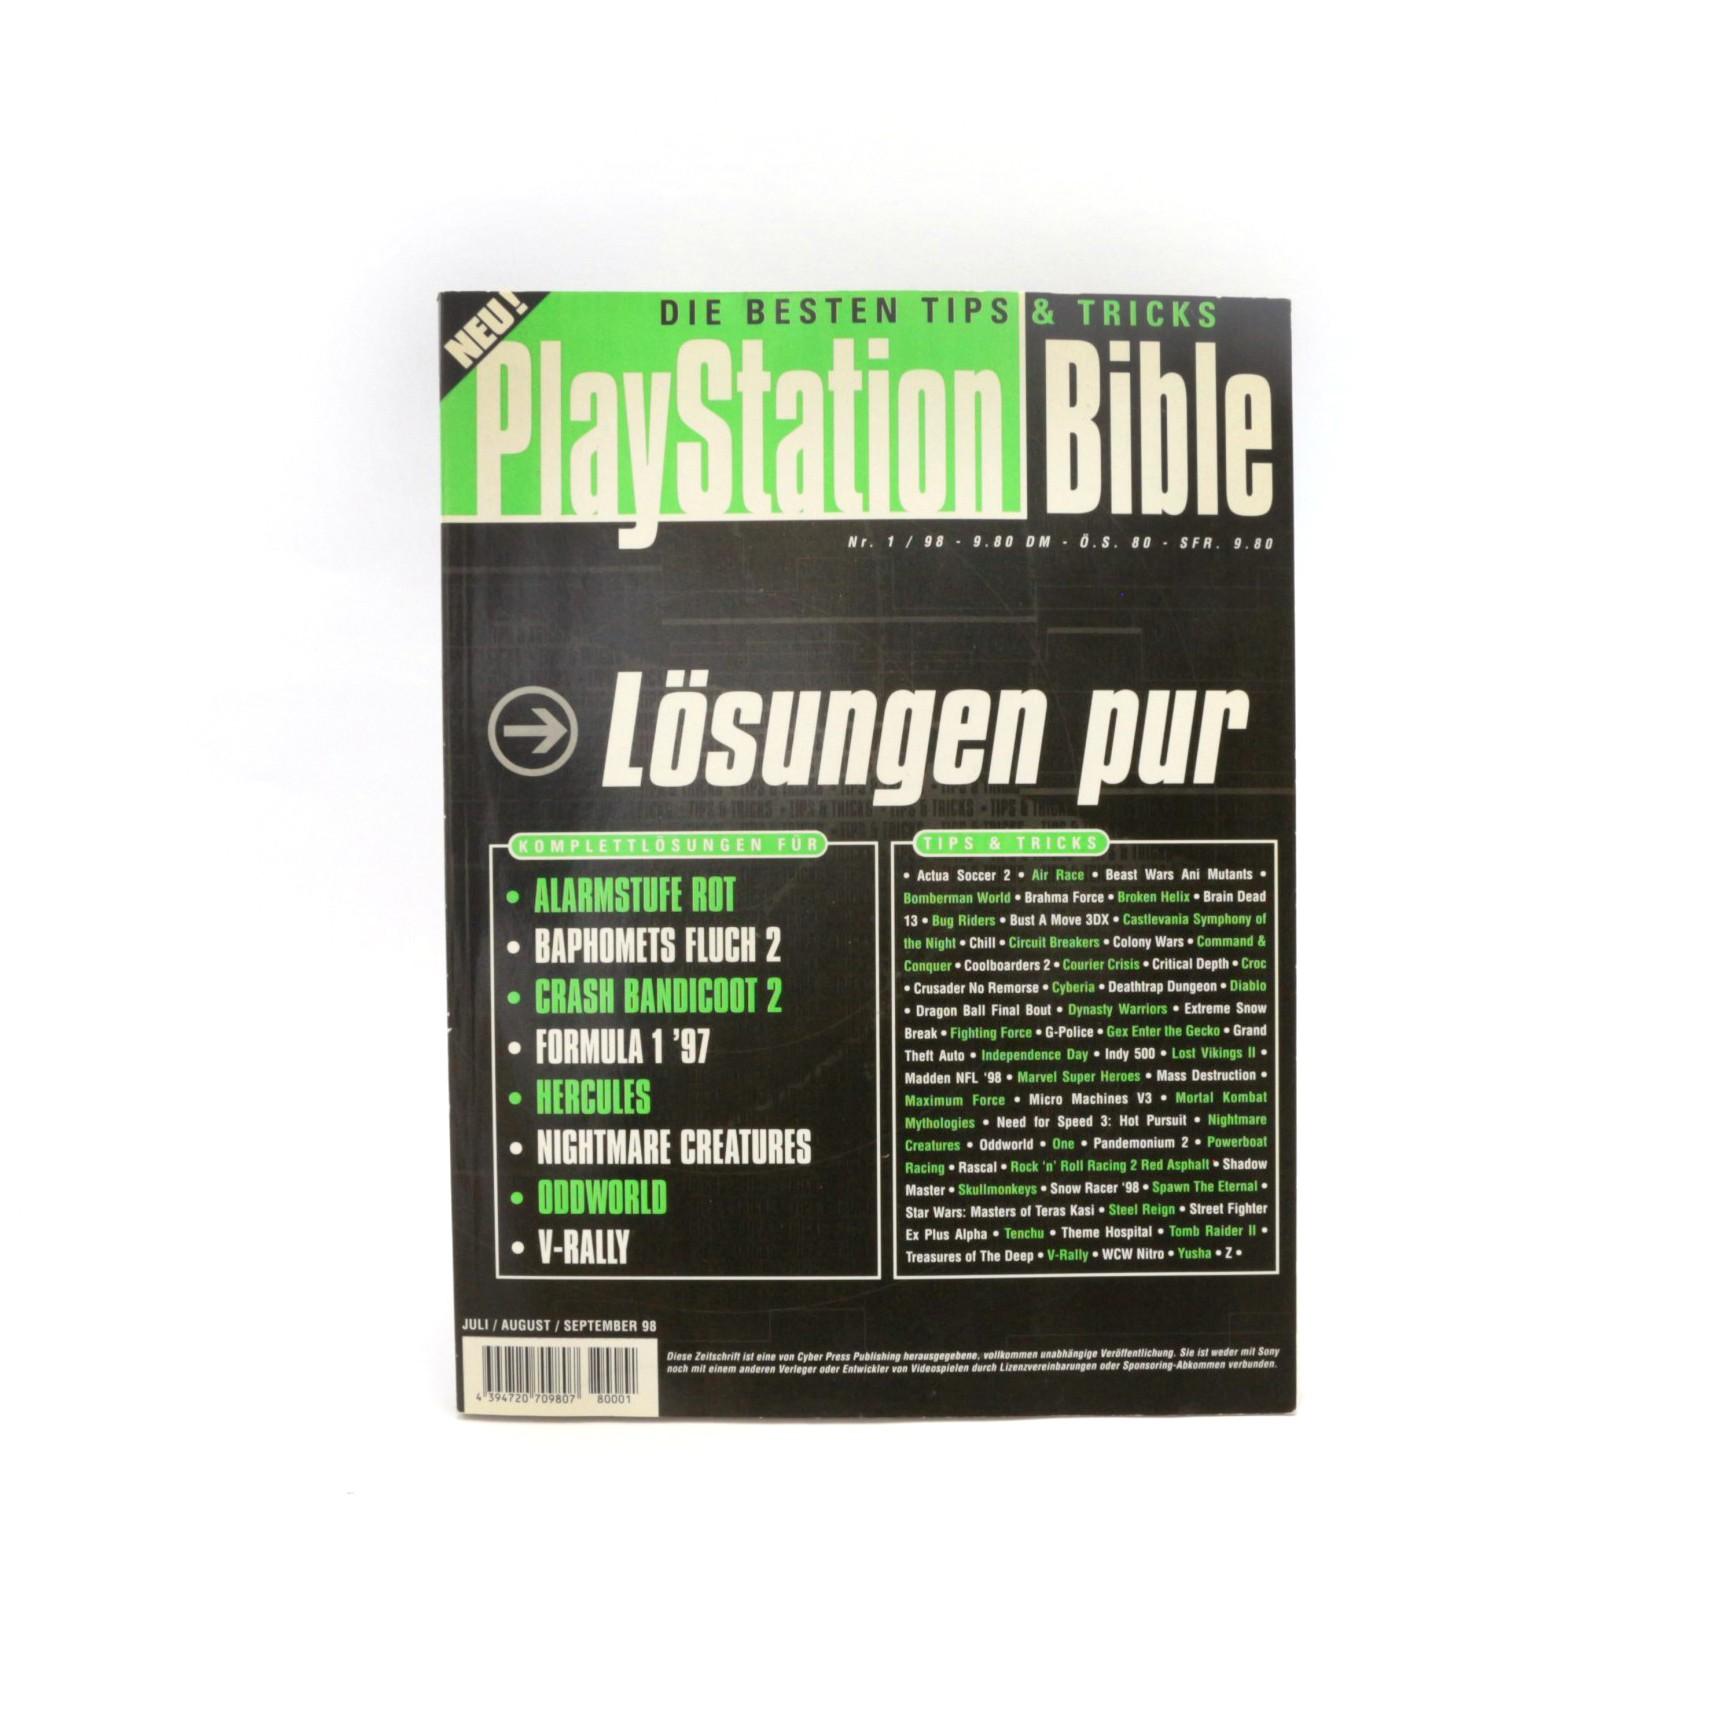 Playstation Bible: Lösungen Pur Nr. 1/98